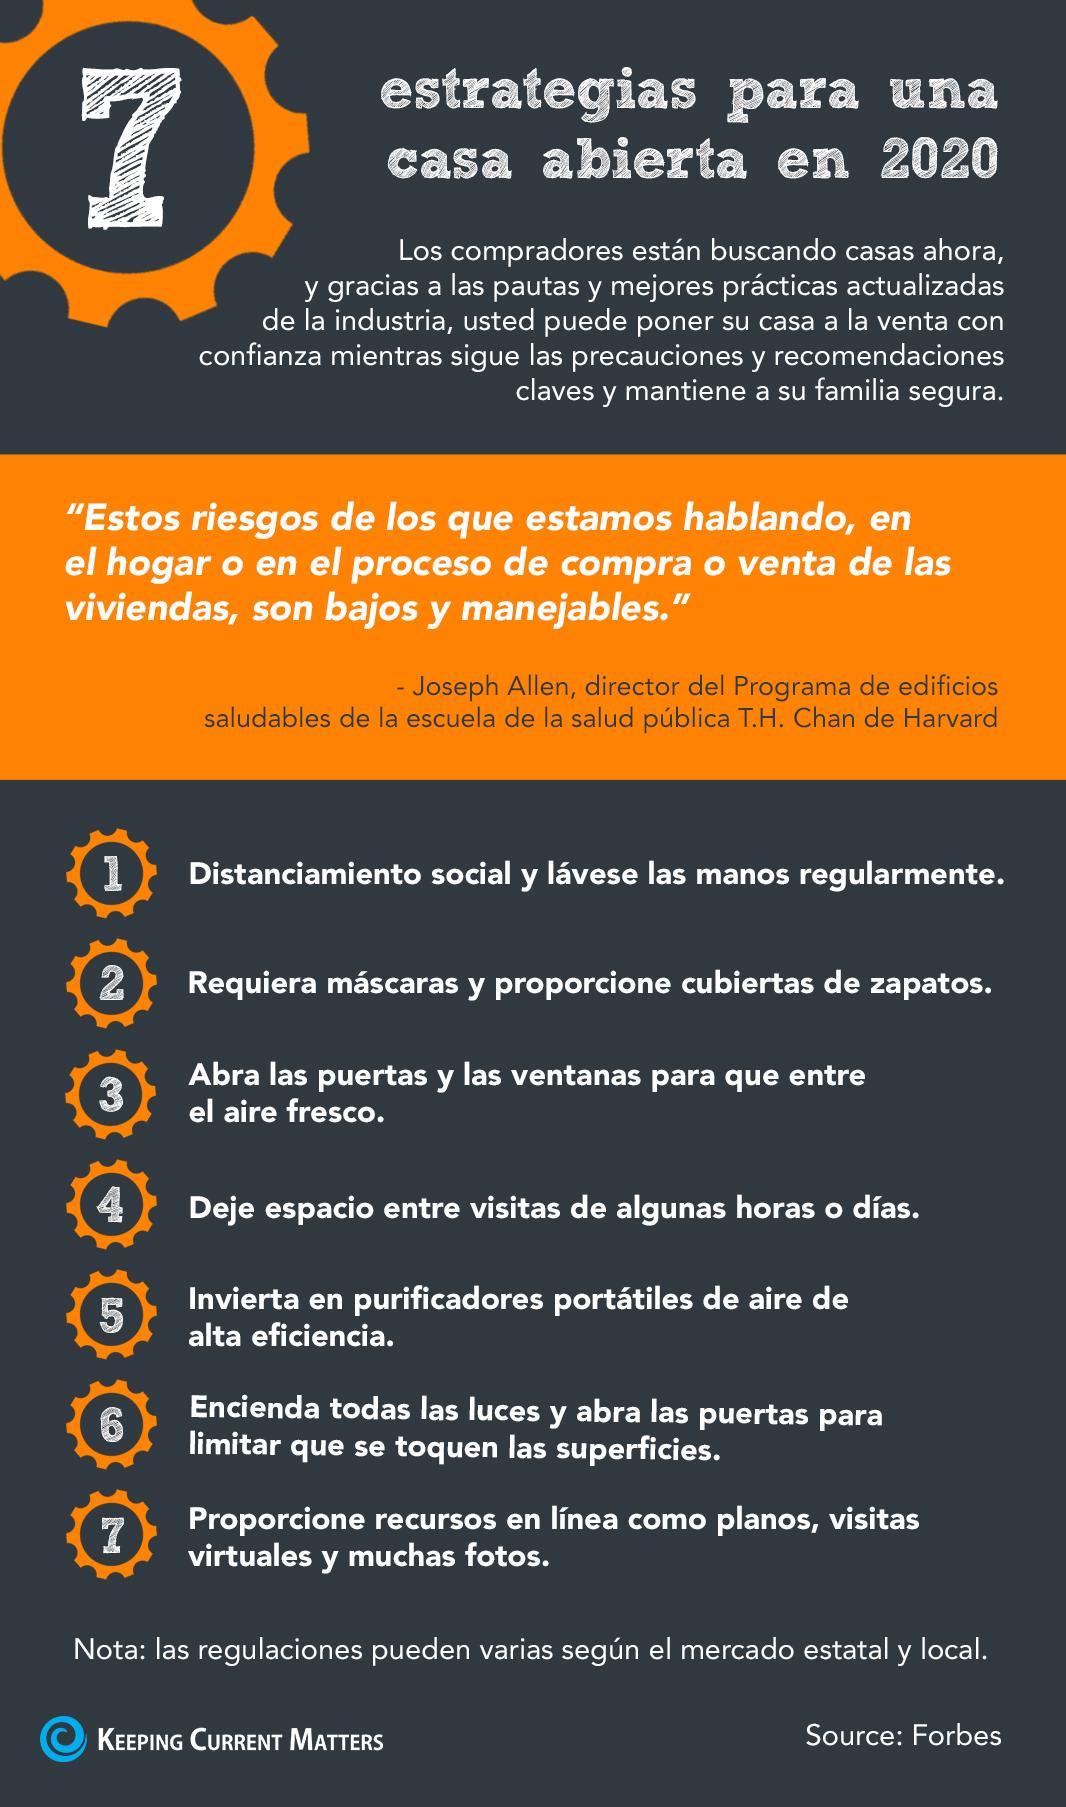 7 estrategias para una casa abierta en 2020 [Infografía] | Keeping Current Matters